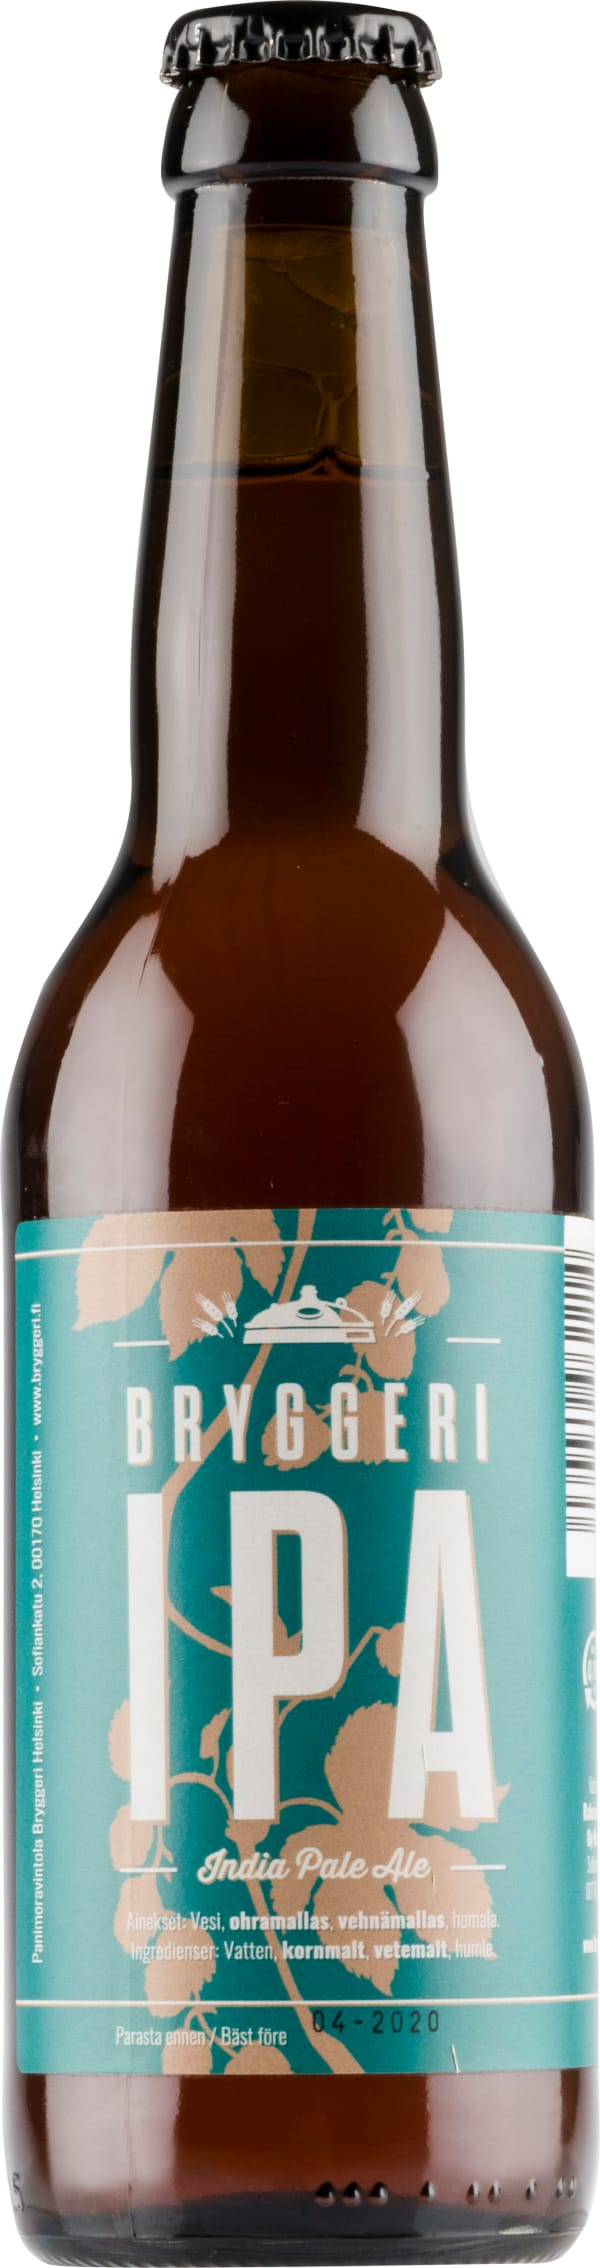 Bryggeri IPA